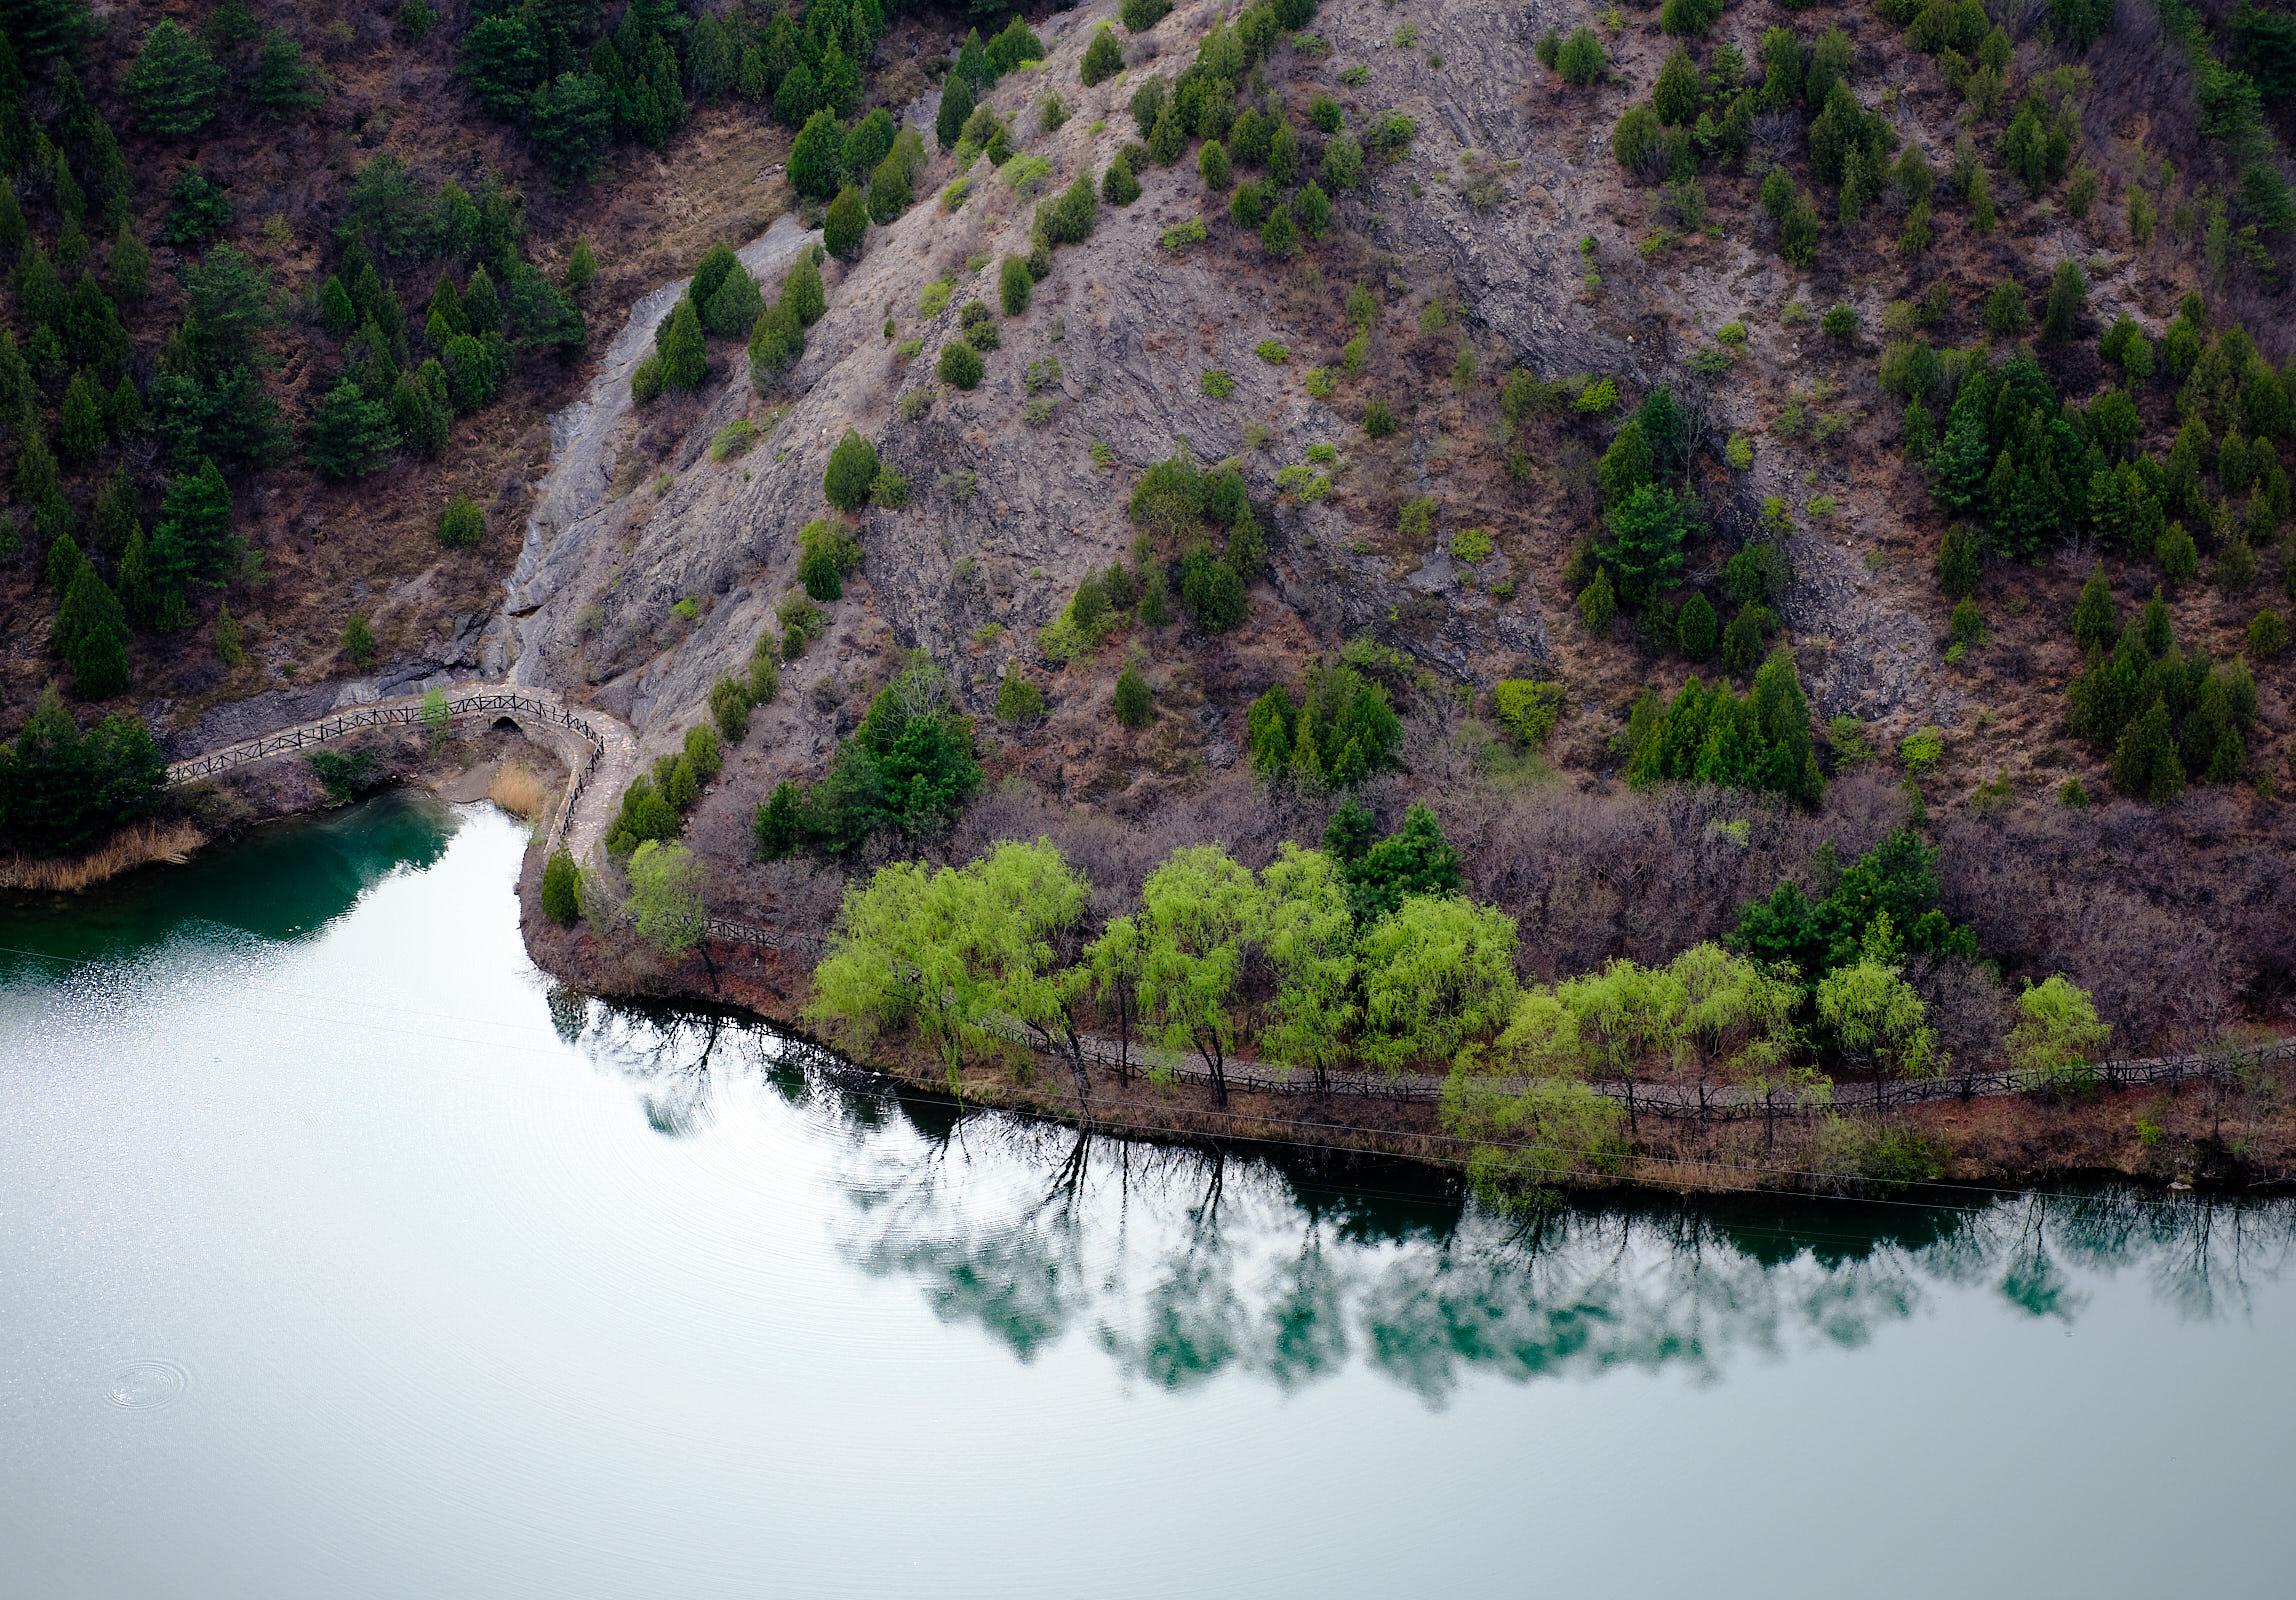 Reflection of trees in lake Gubei Watertown